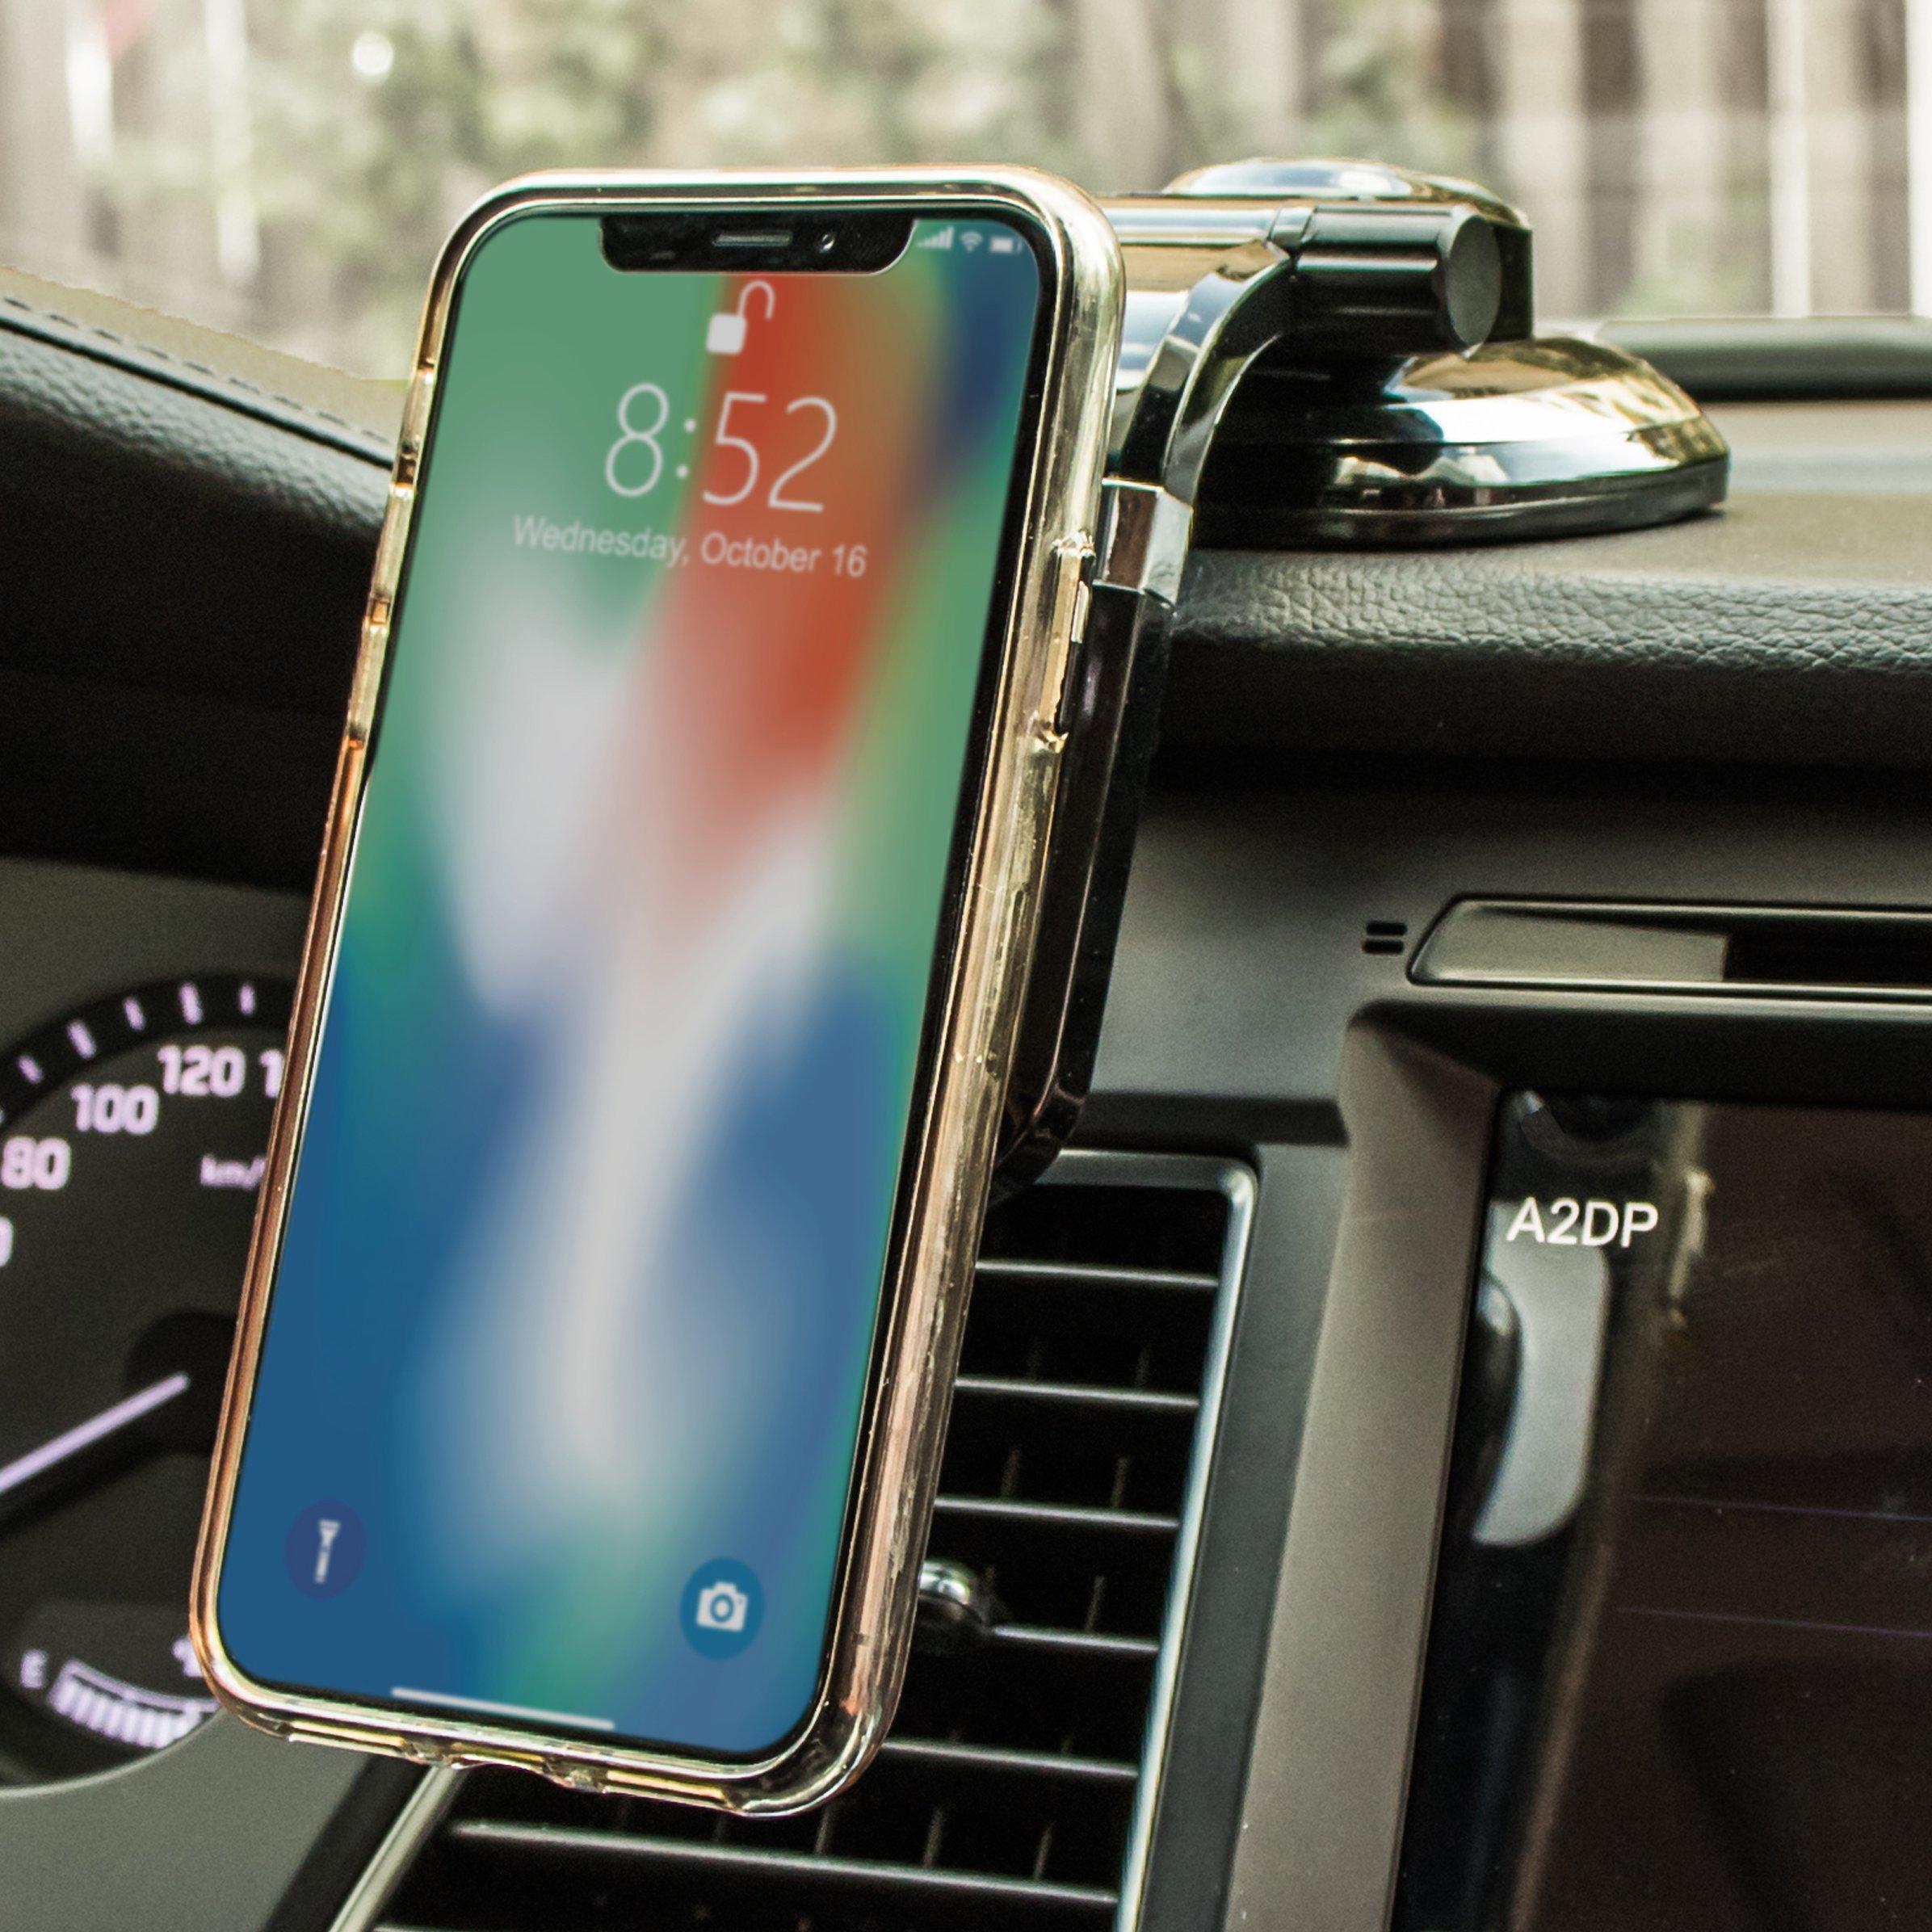 Iphone 8 plus car phone holder scott c fold towels